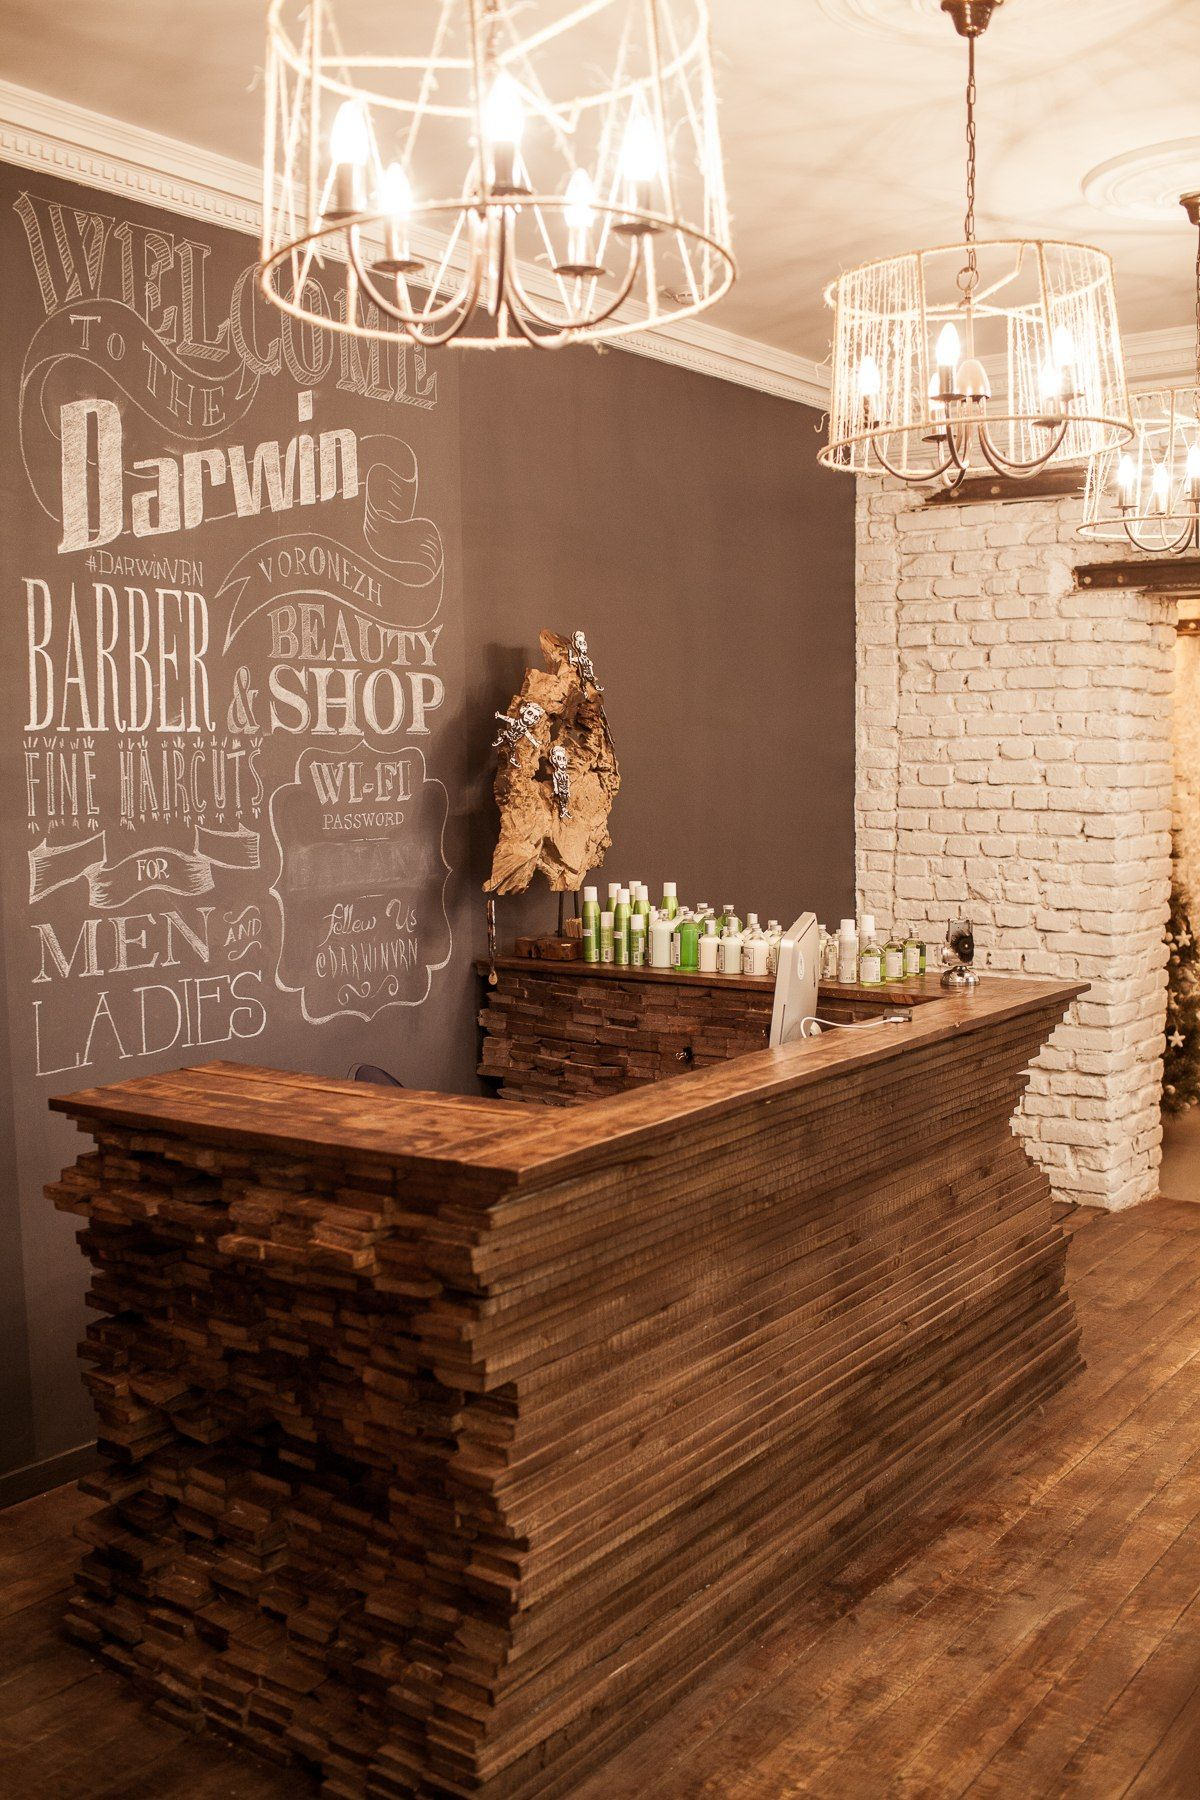 Loft Interior Barbershop Beautyshop Style Haircuts Wood